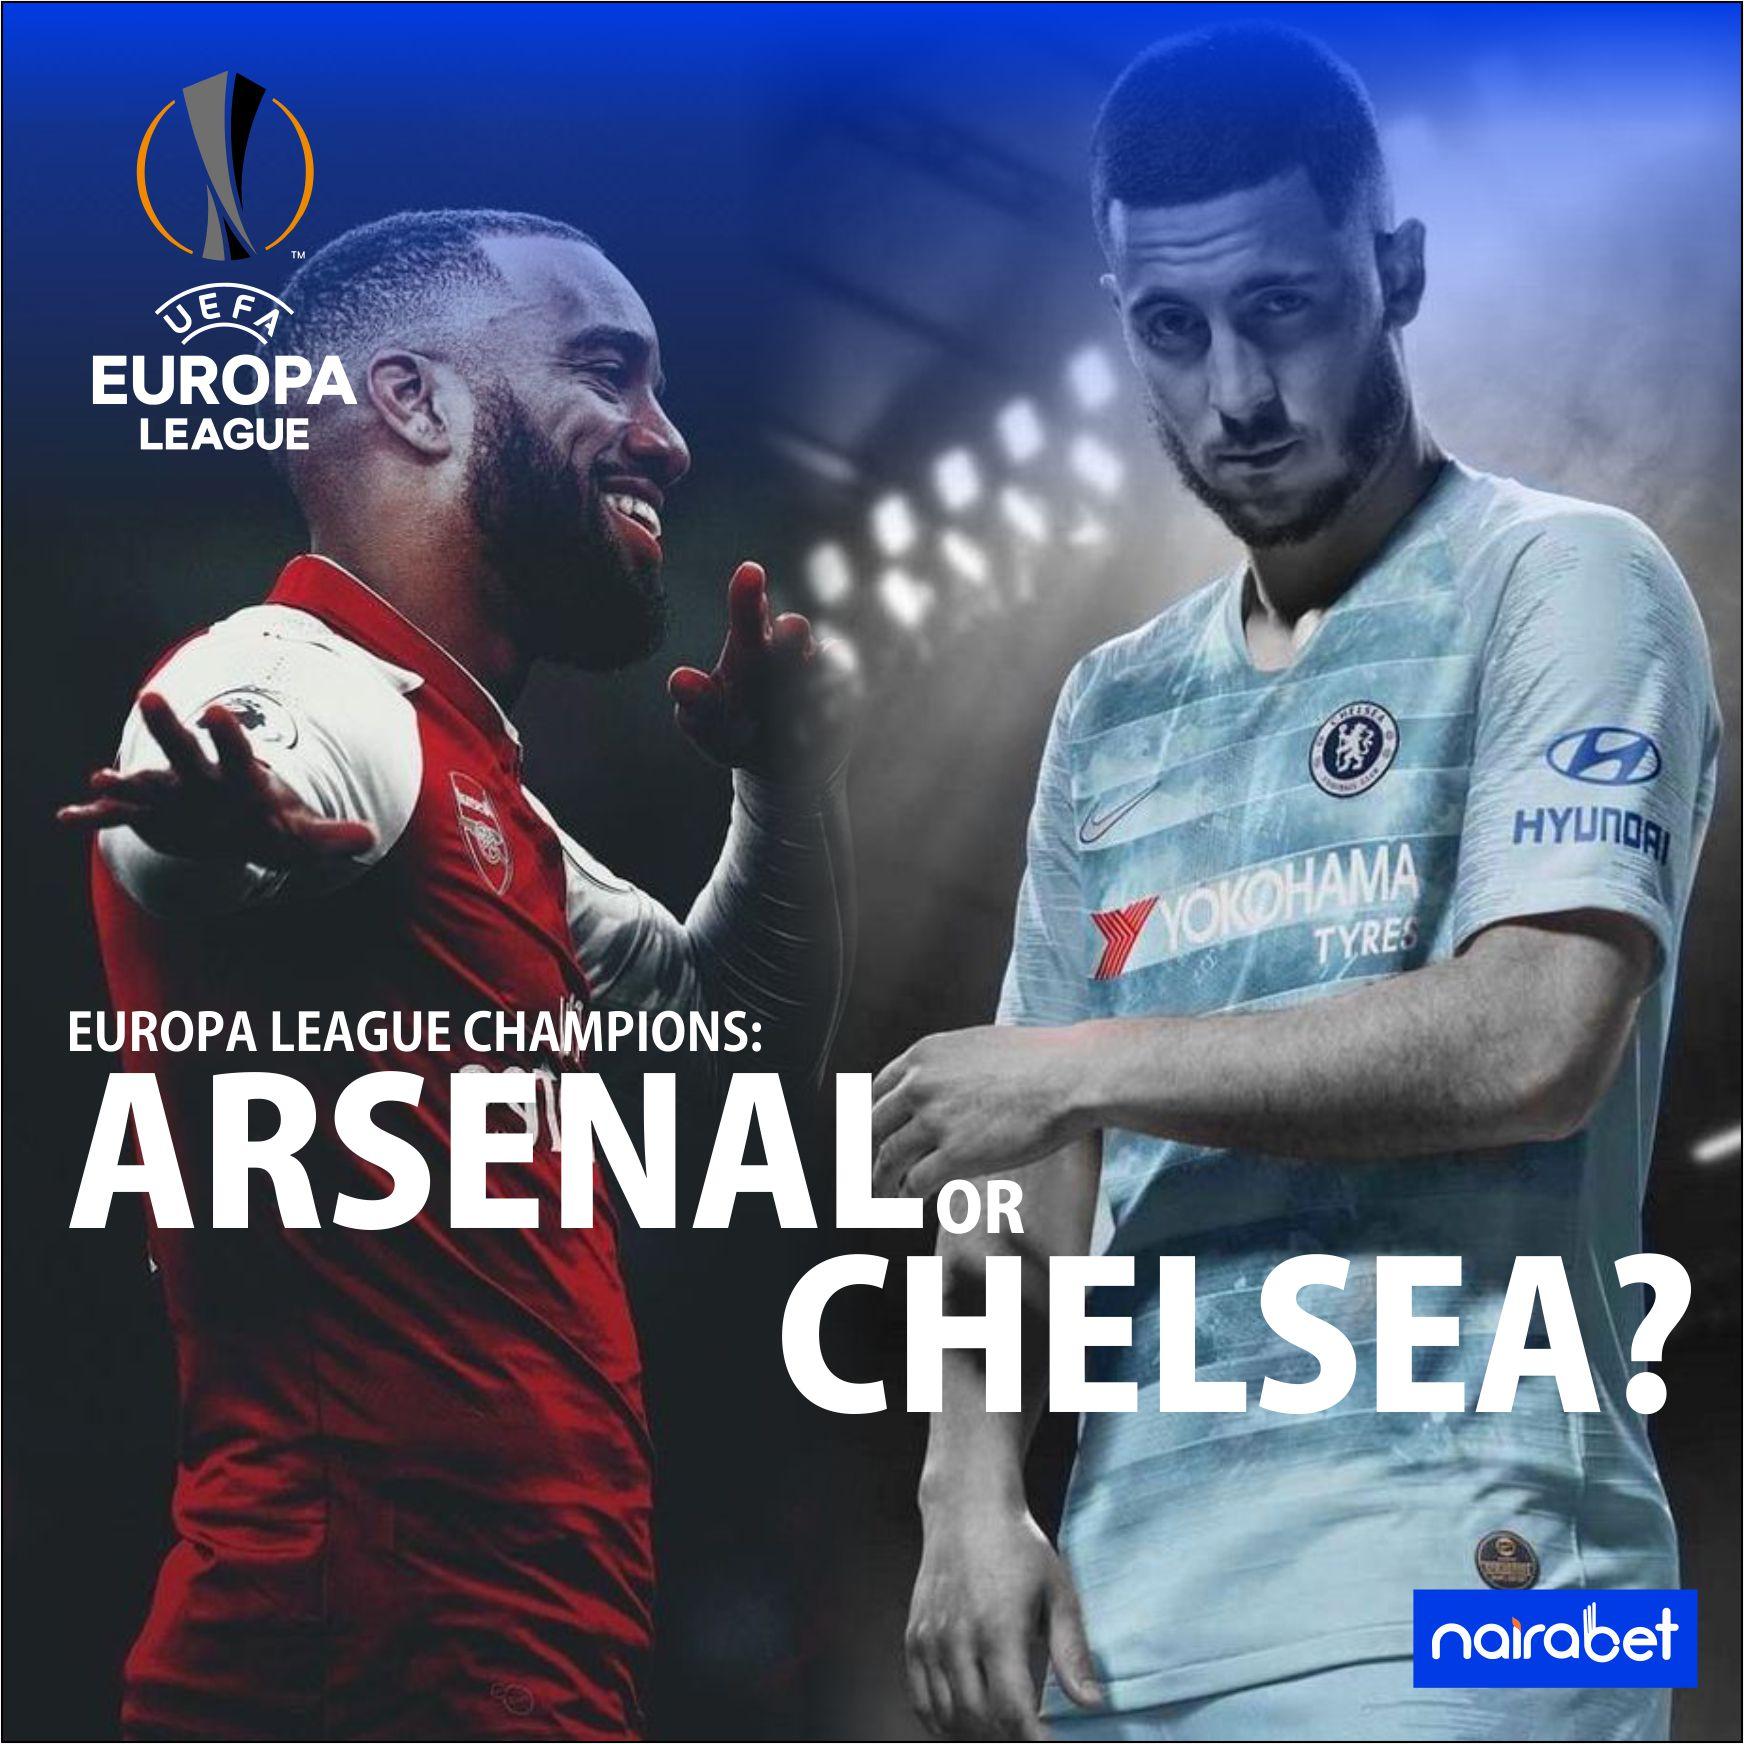 Europa league champion